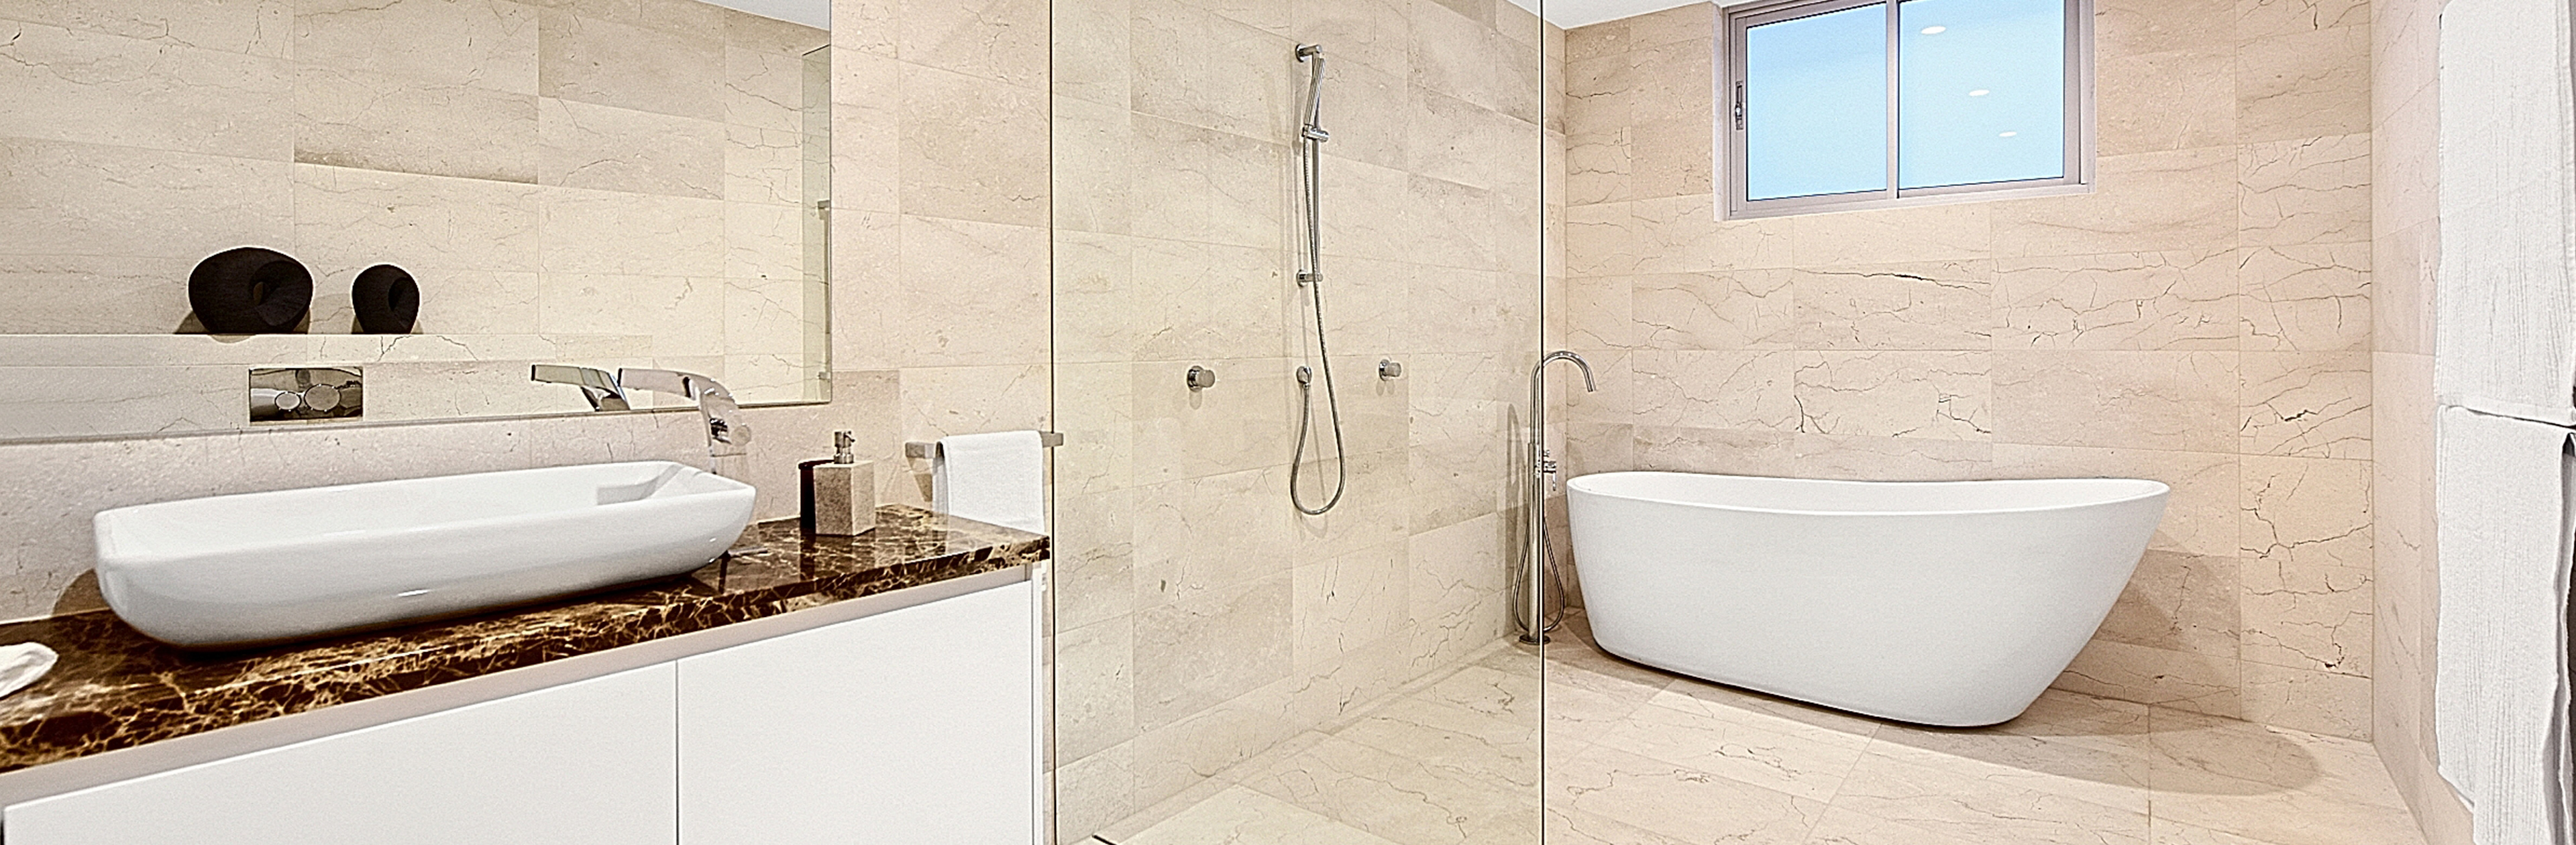 Bathroom Renovations Melbourne Bathroom Remodeling Company